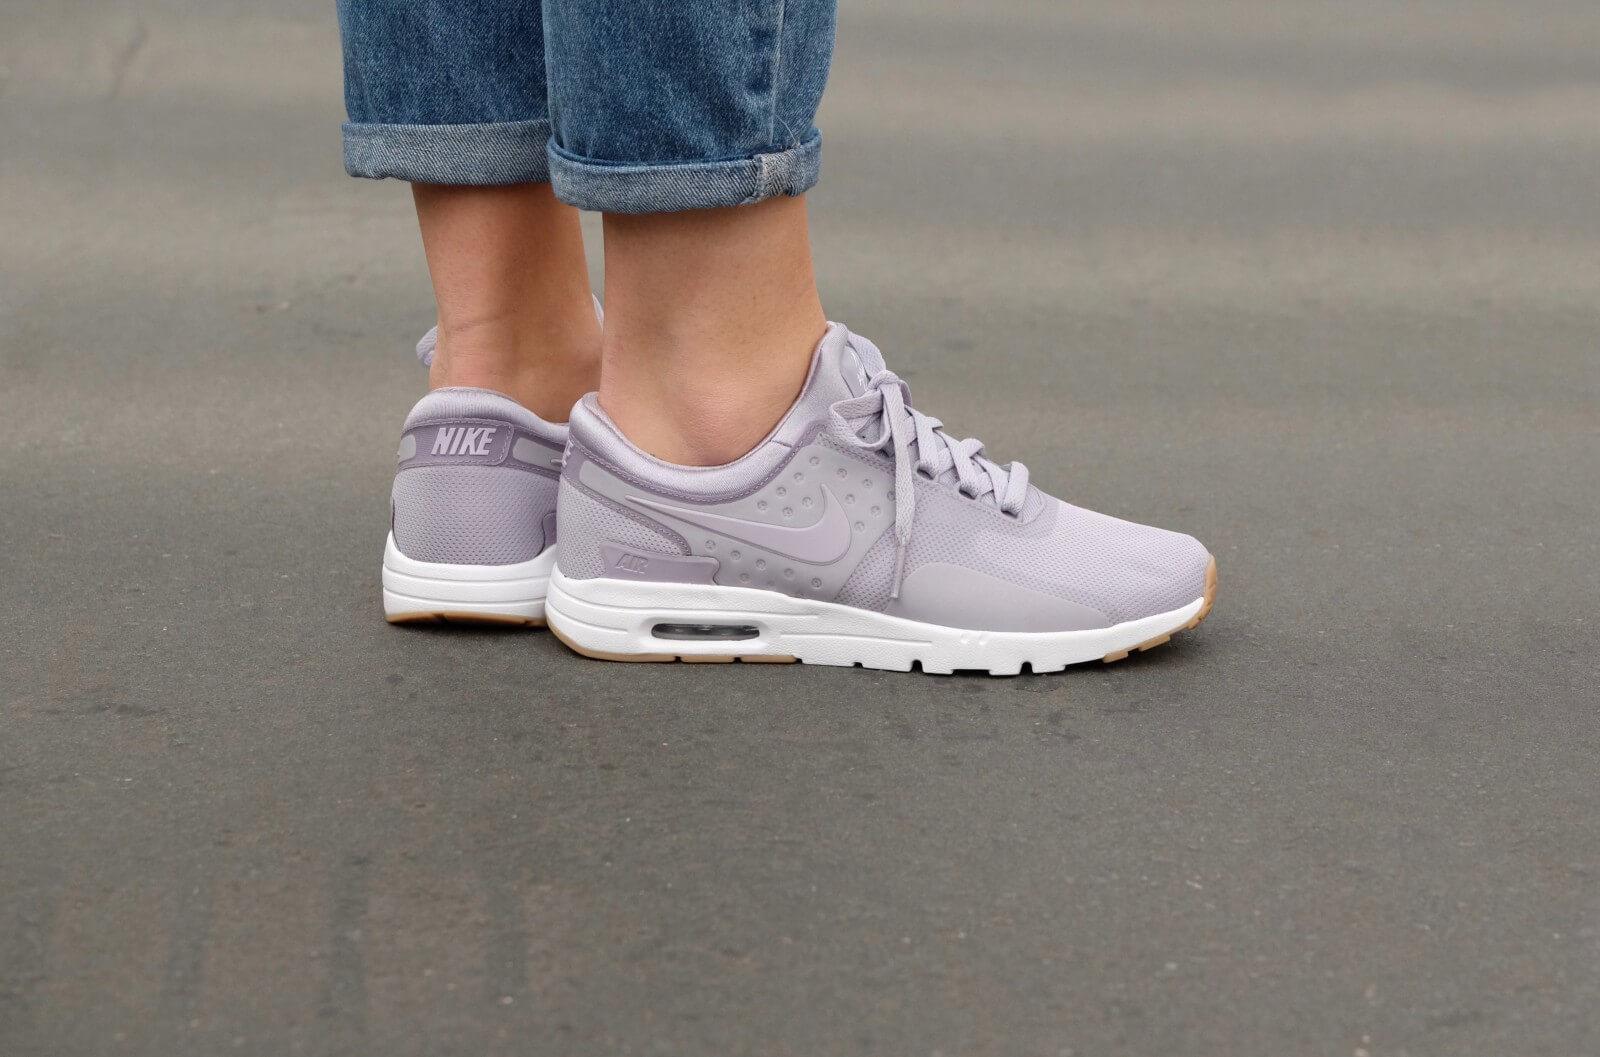 Nike WMNS Air Max Zero Provence Purple